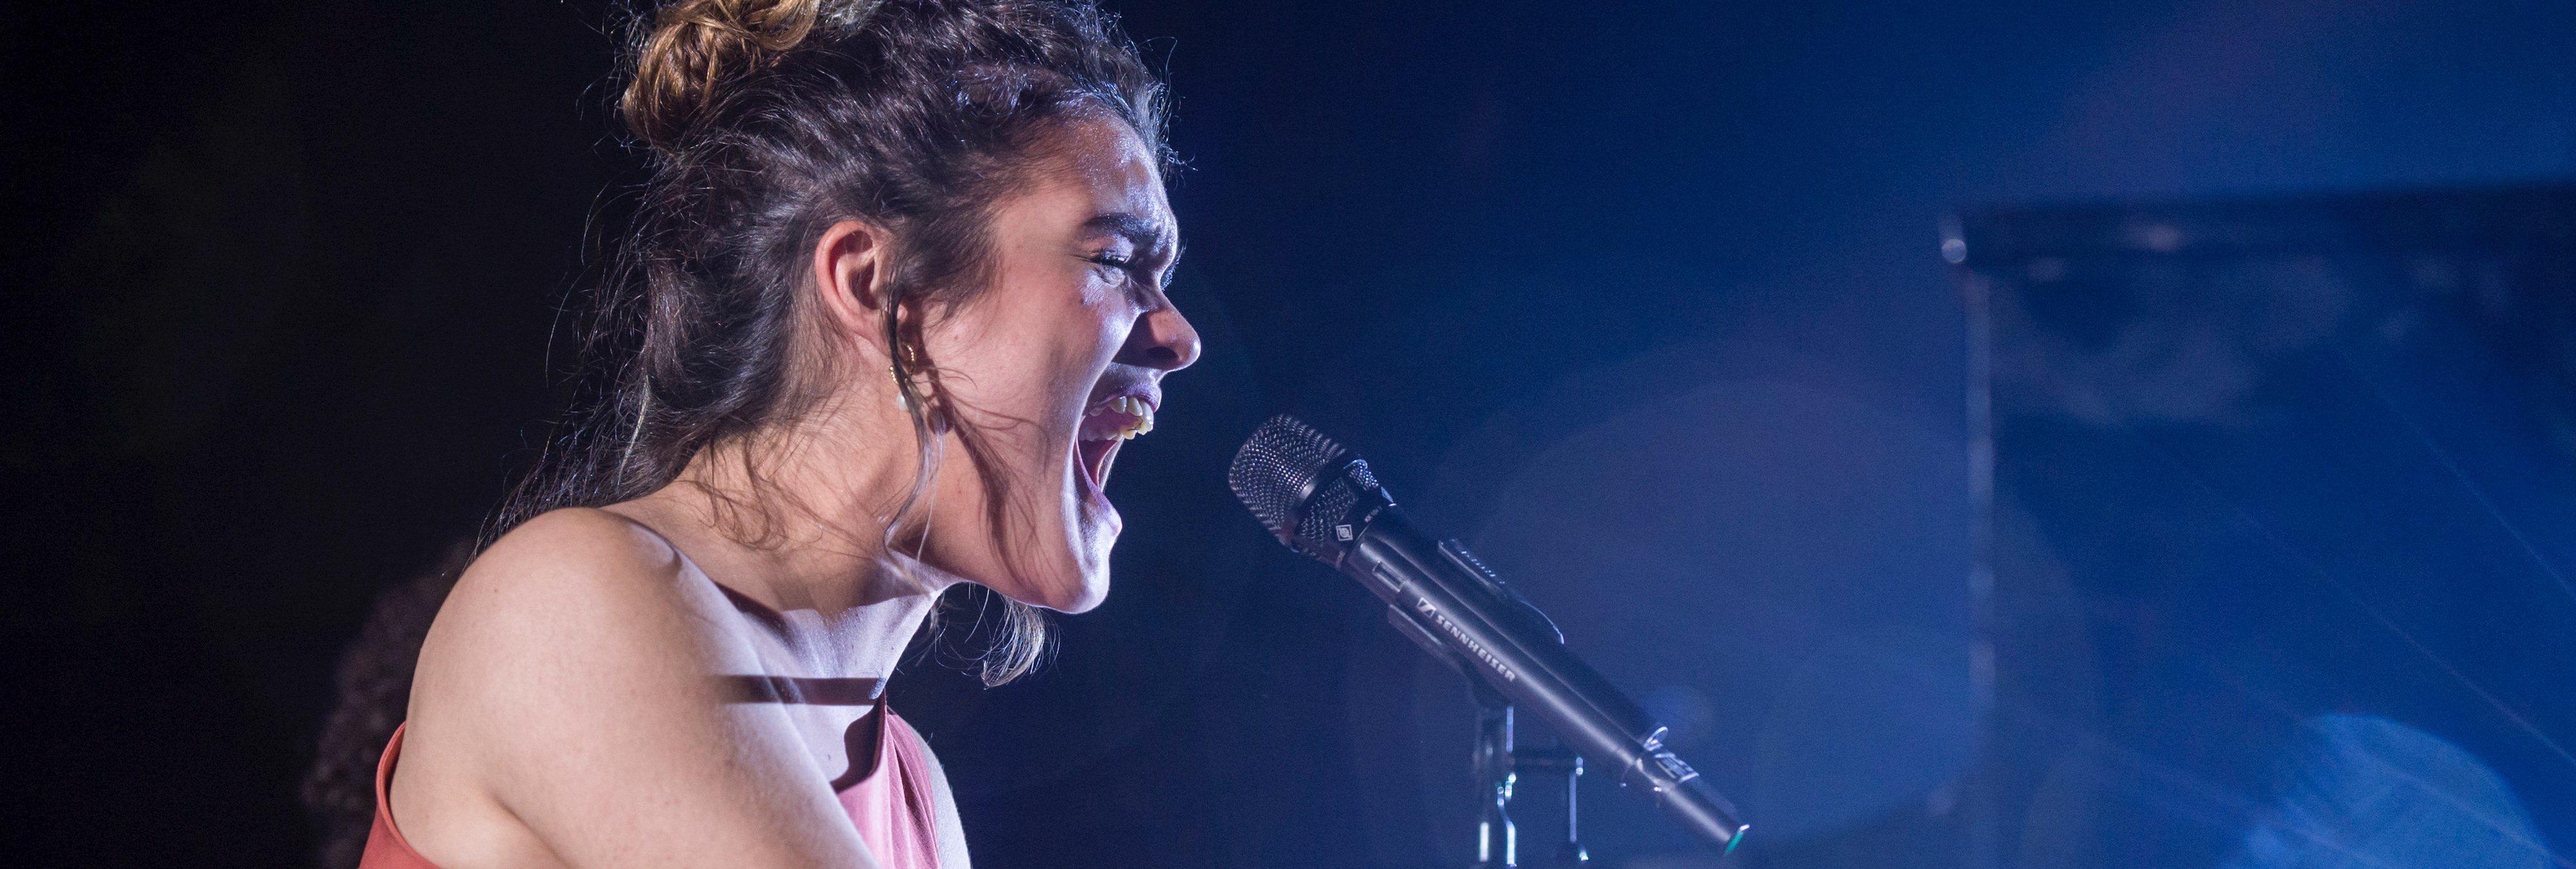 "Amaia, arrepentida de haber ido a Eurovisión: ""Lo pasé mal"""